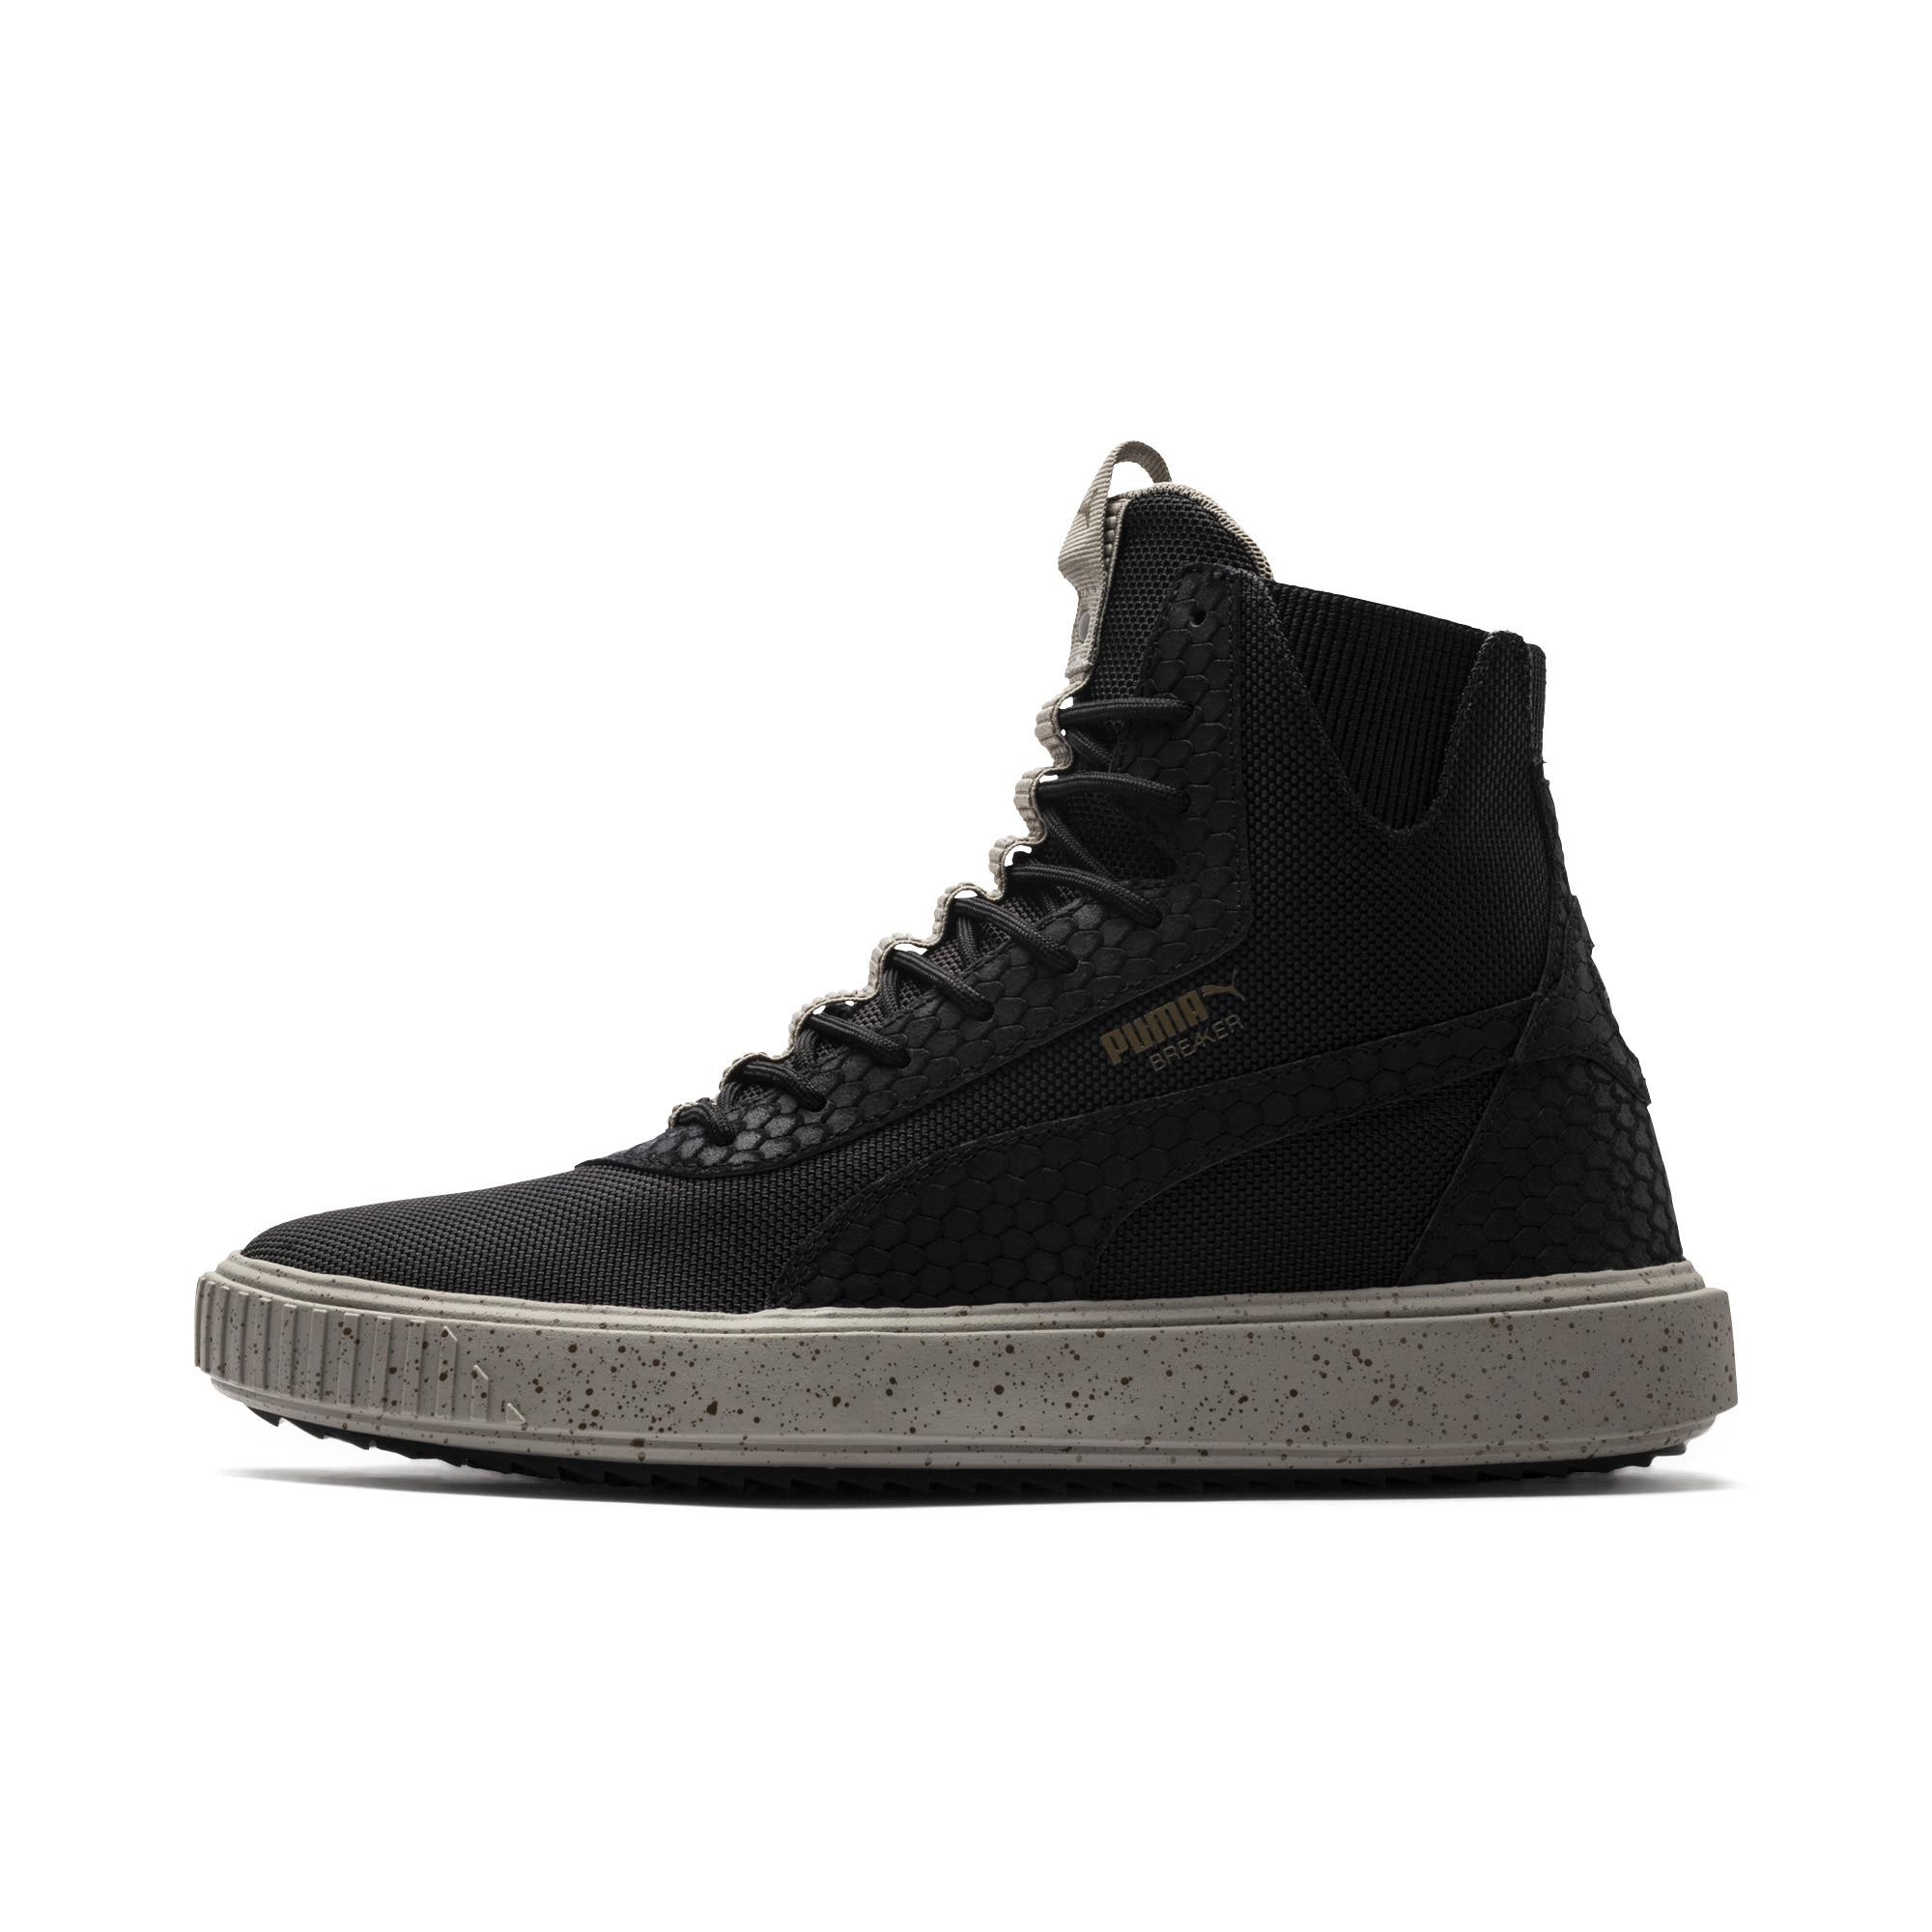 0dd834f0efa Lyst - PUMA Evolution Breaker Hi Blocked Sneakers in Black for Men